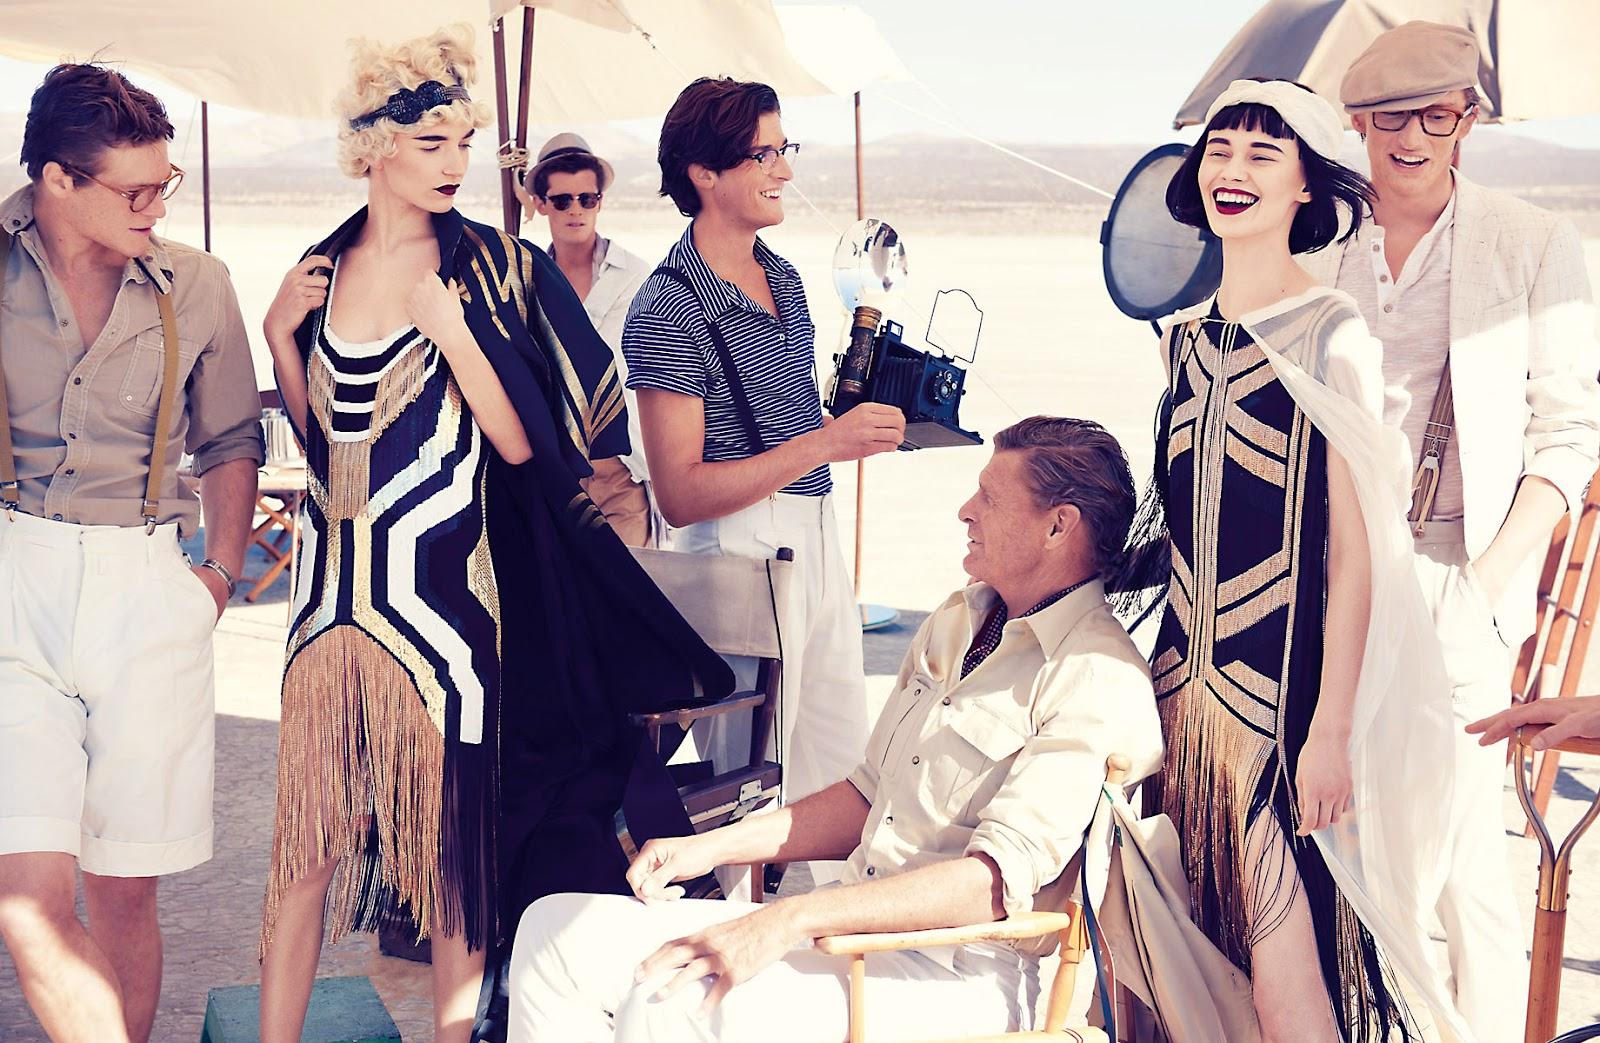 http://1.bp.blogspot.com/-lZ5lMgKRELk/T2-Lq5maxCI/AAAAAAAADLg/8acGSYQn-N4/s1600/Ranya+Mordanova+&+Janice+Seinen+Alida+by+Phil+Poynter+%28Desert+Jazz+-+Vogue+Turkey+March+2012%29+3.jpg